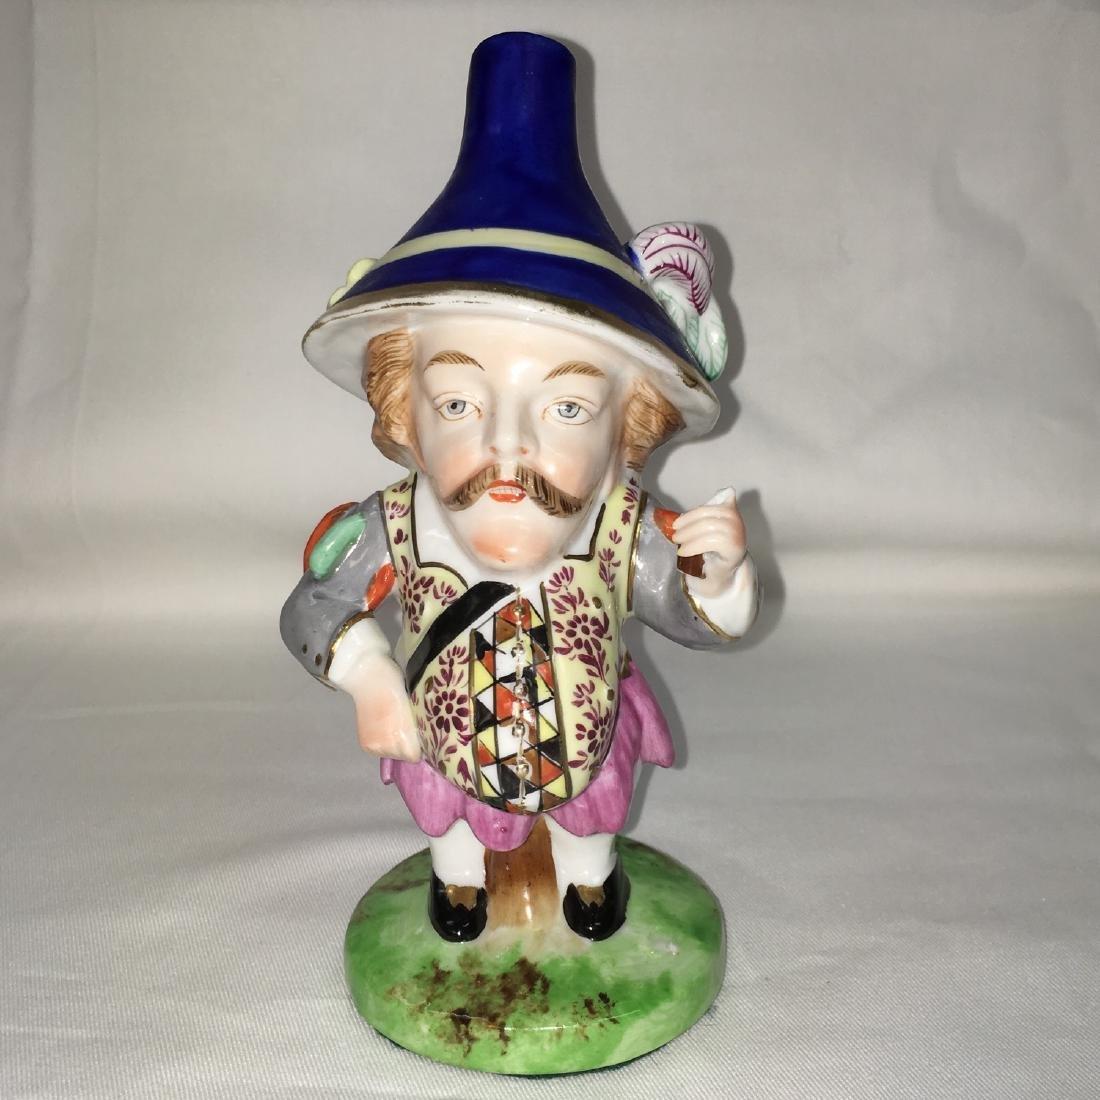 Late 19th C. Derby Porcelain Mansion House Dwarf figure